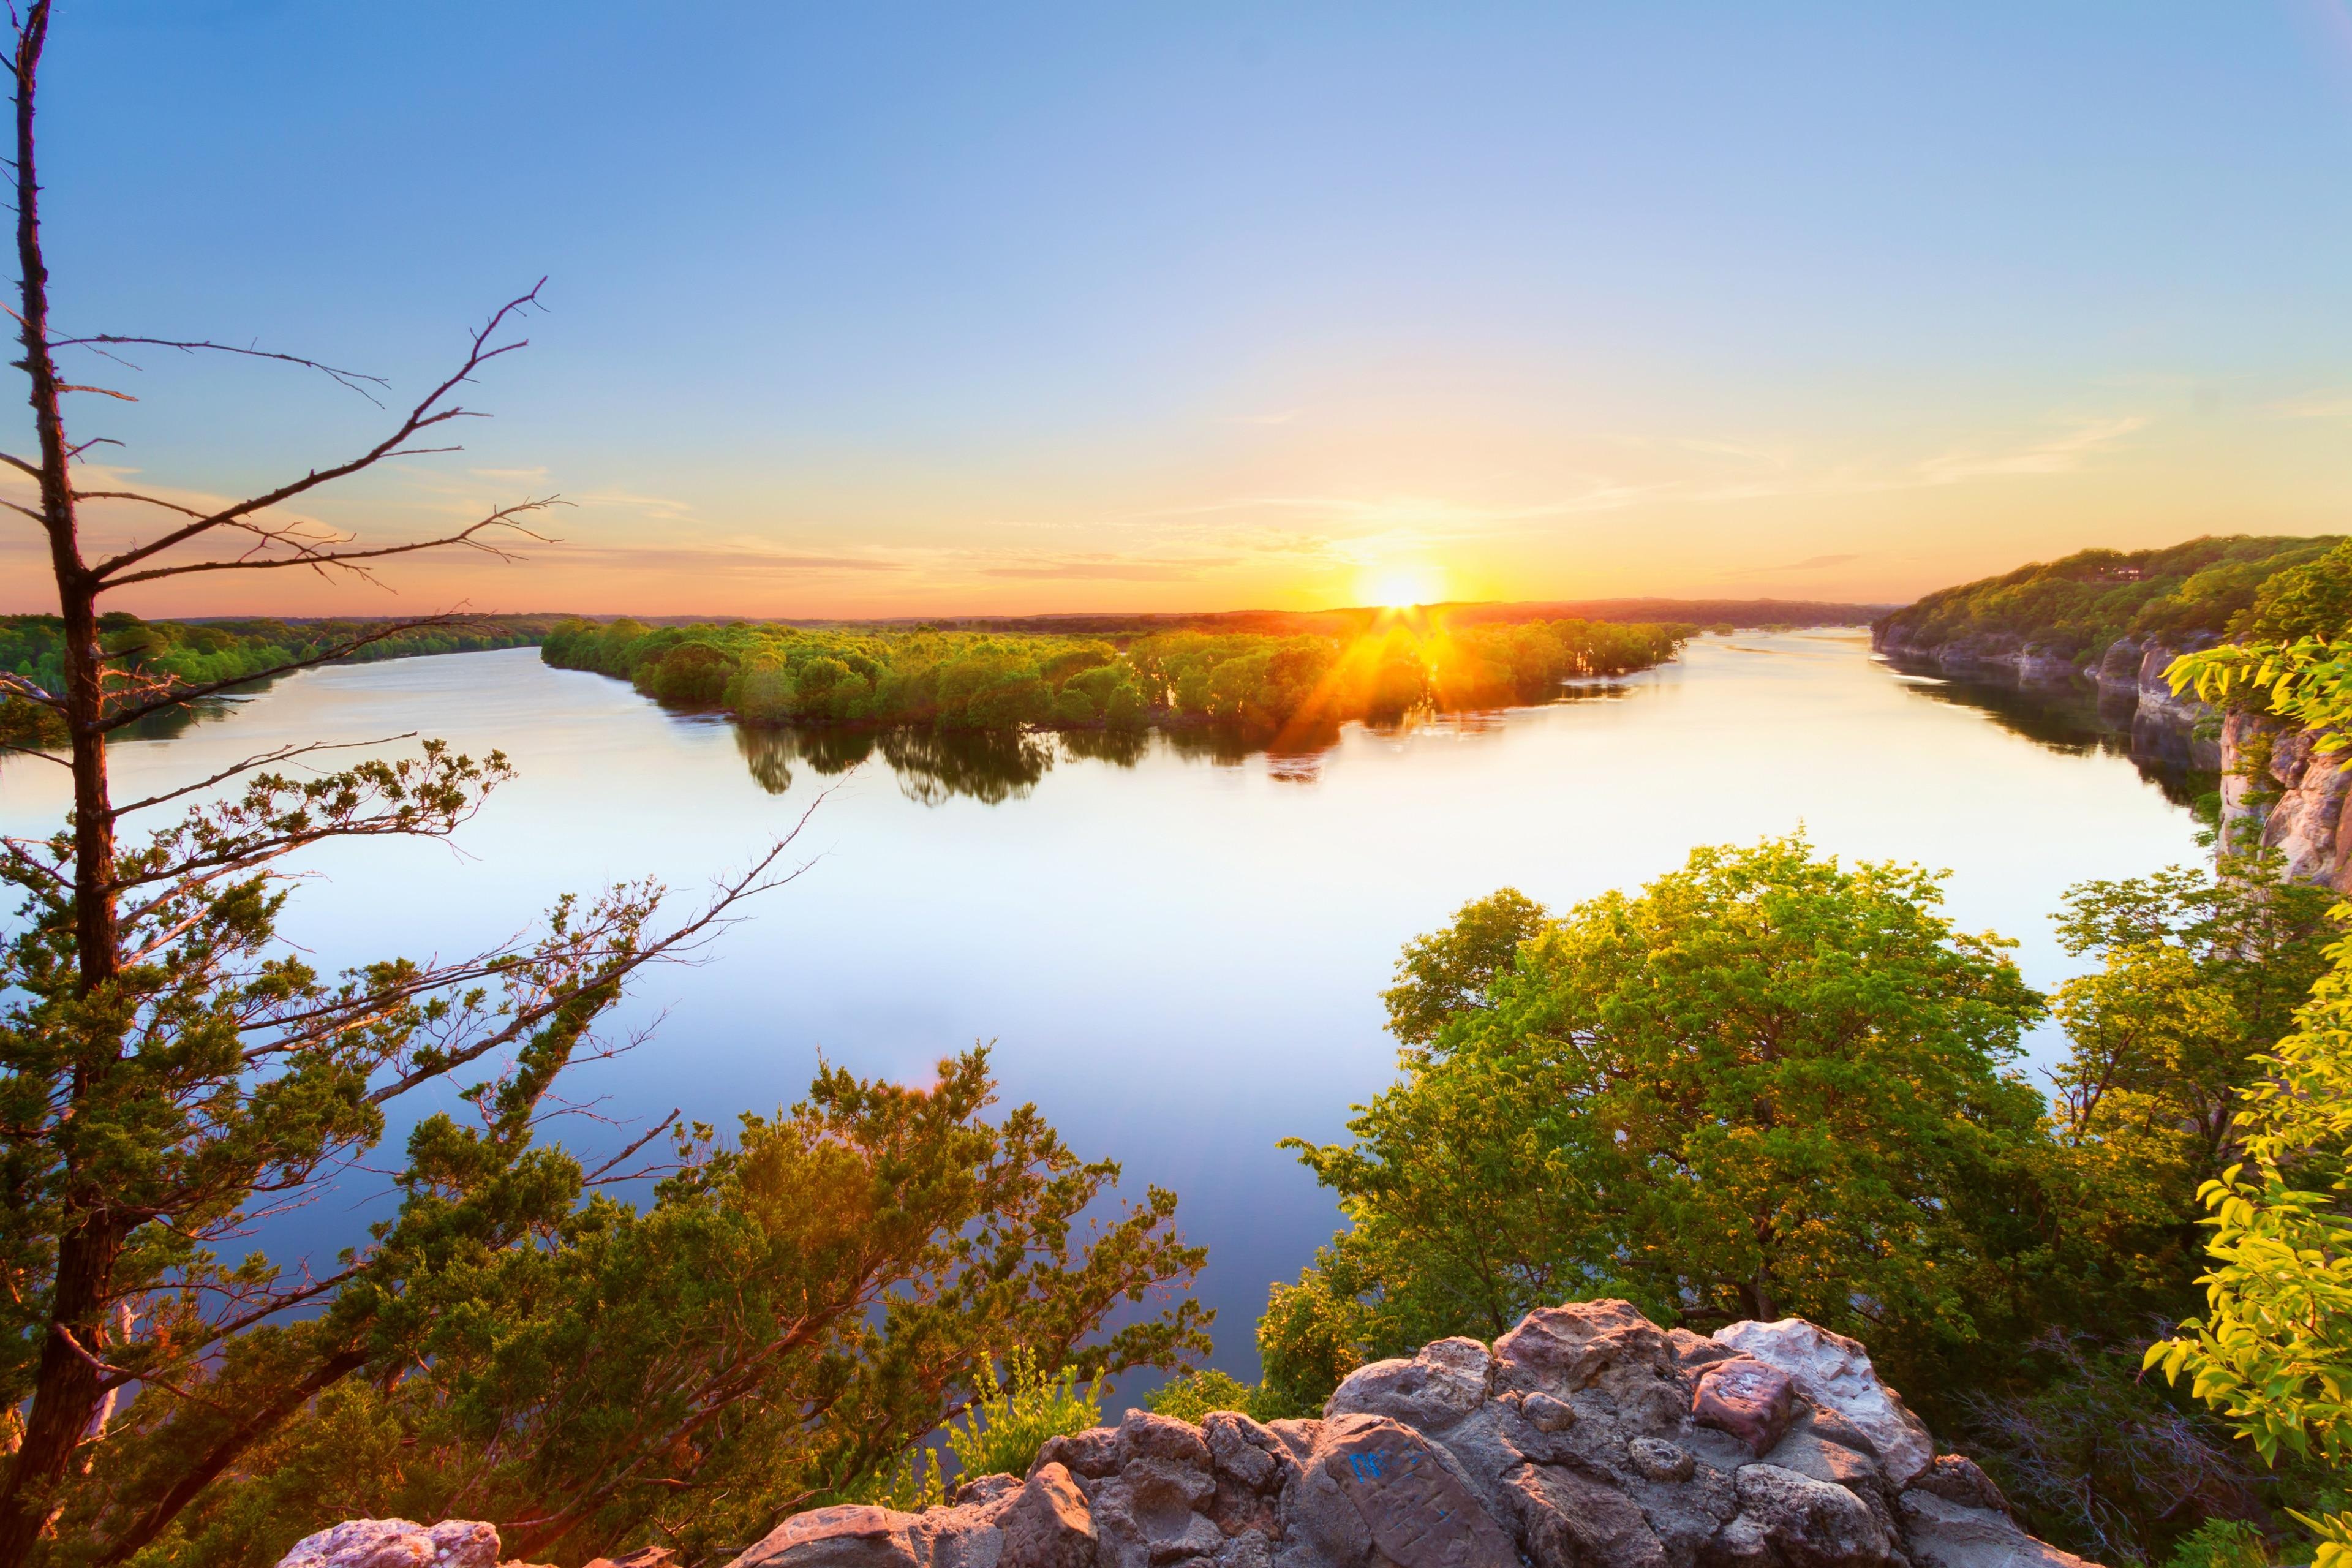 Lake Ozark, Missouri, United States of America